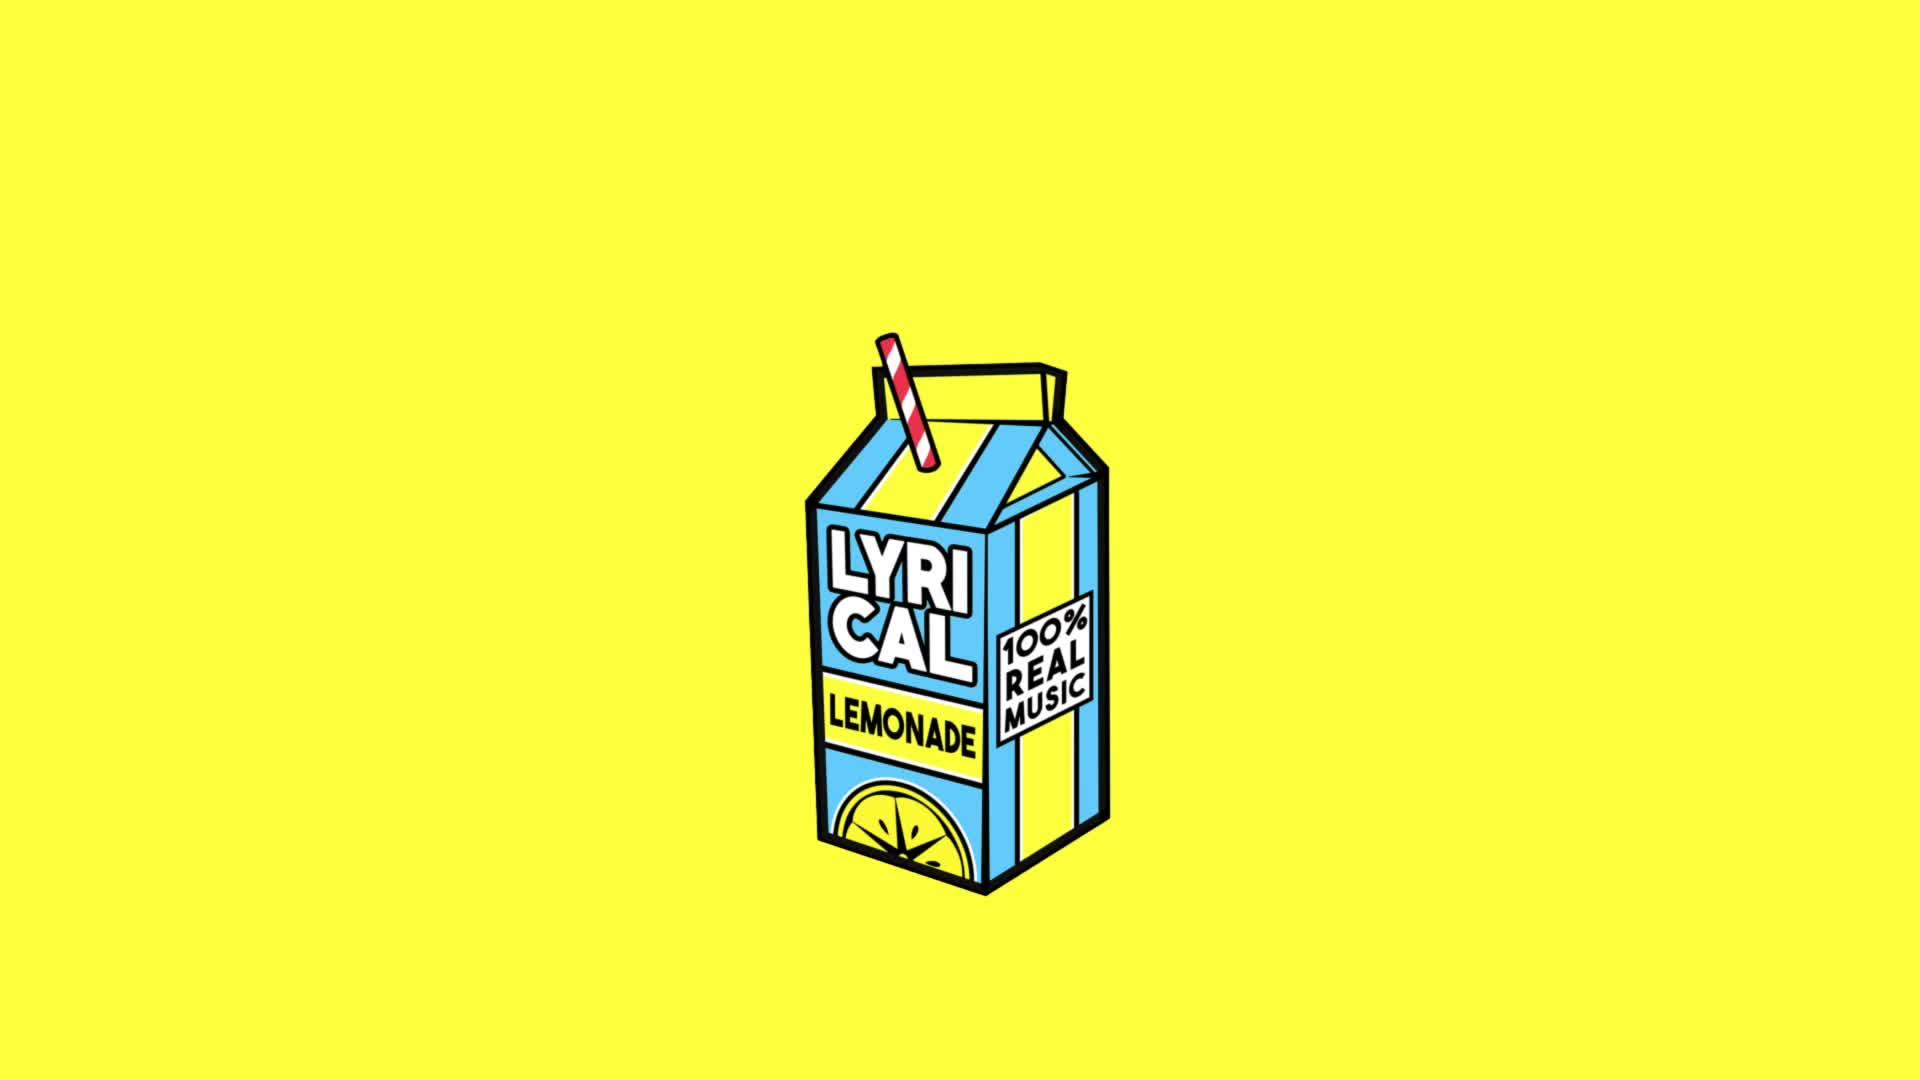 Lyrical Lemonade Wallpapers Top Free Lyrical Lemonade Backgrounds Wallpaperaccess